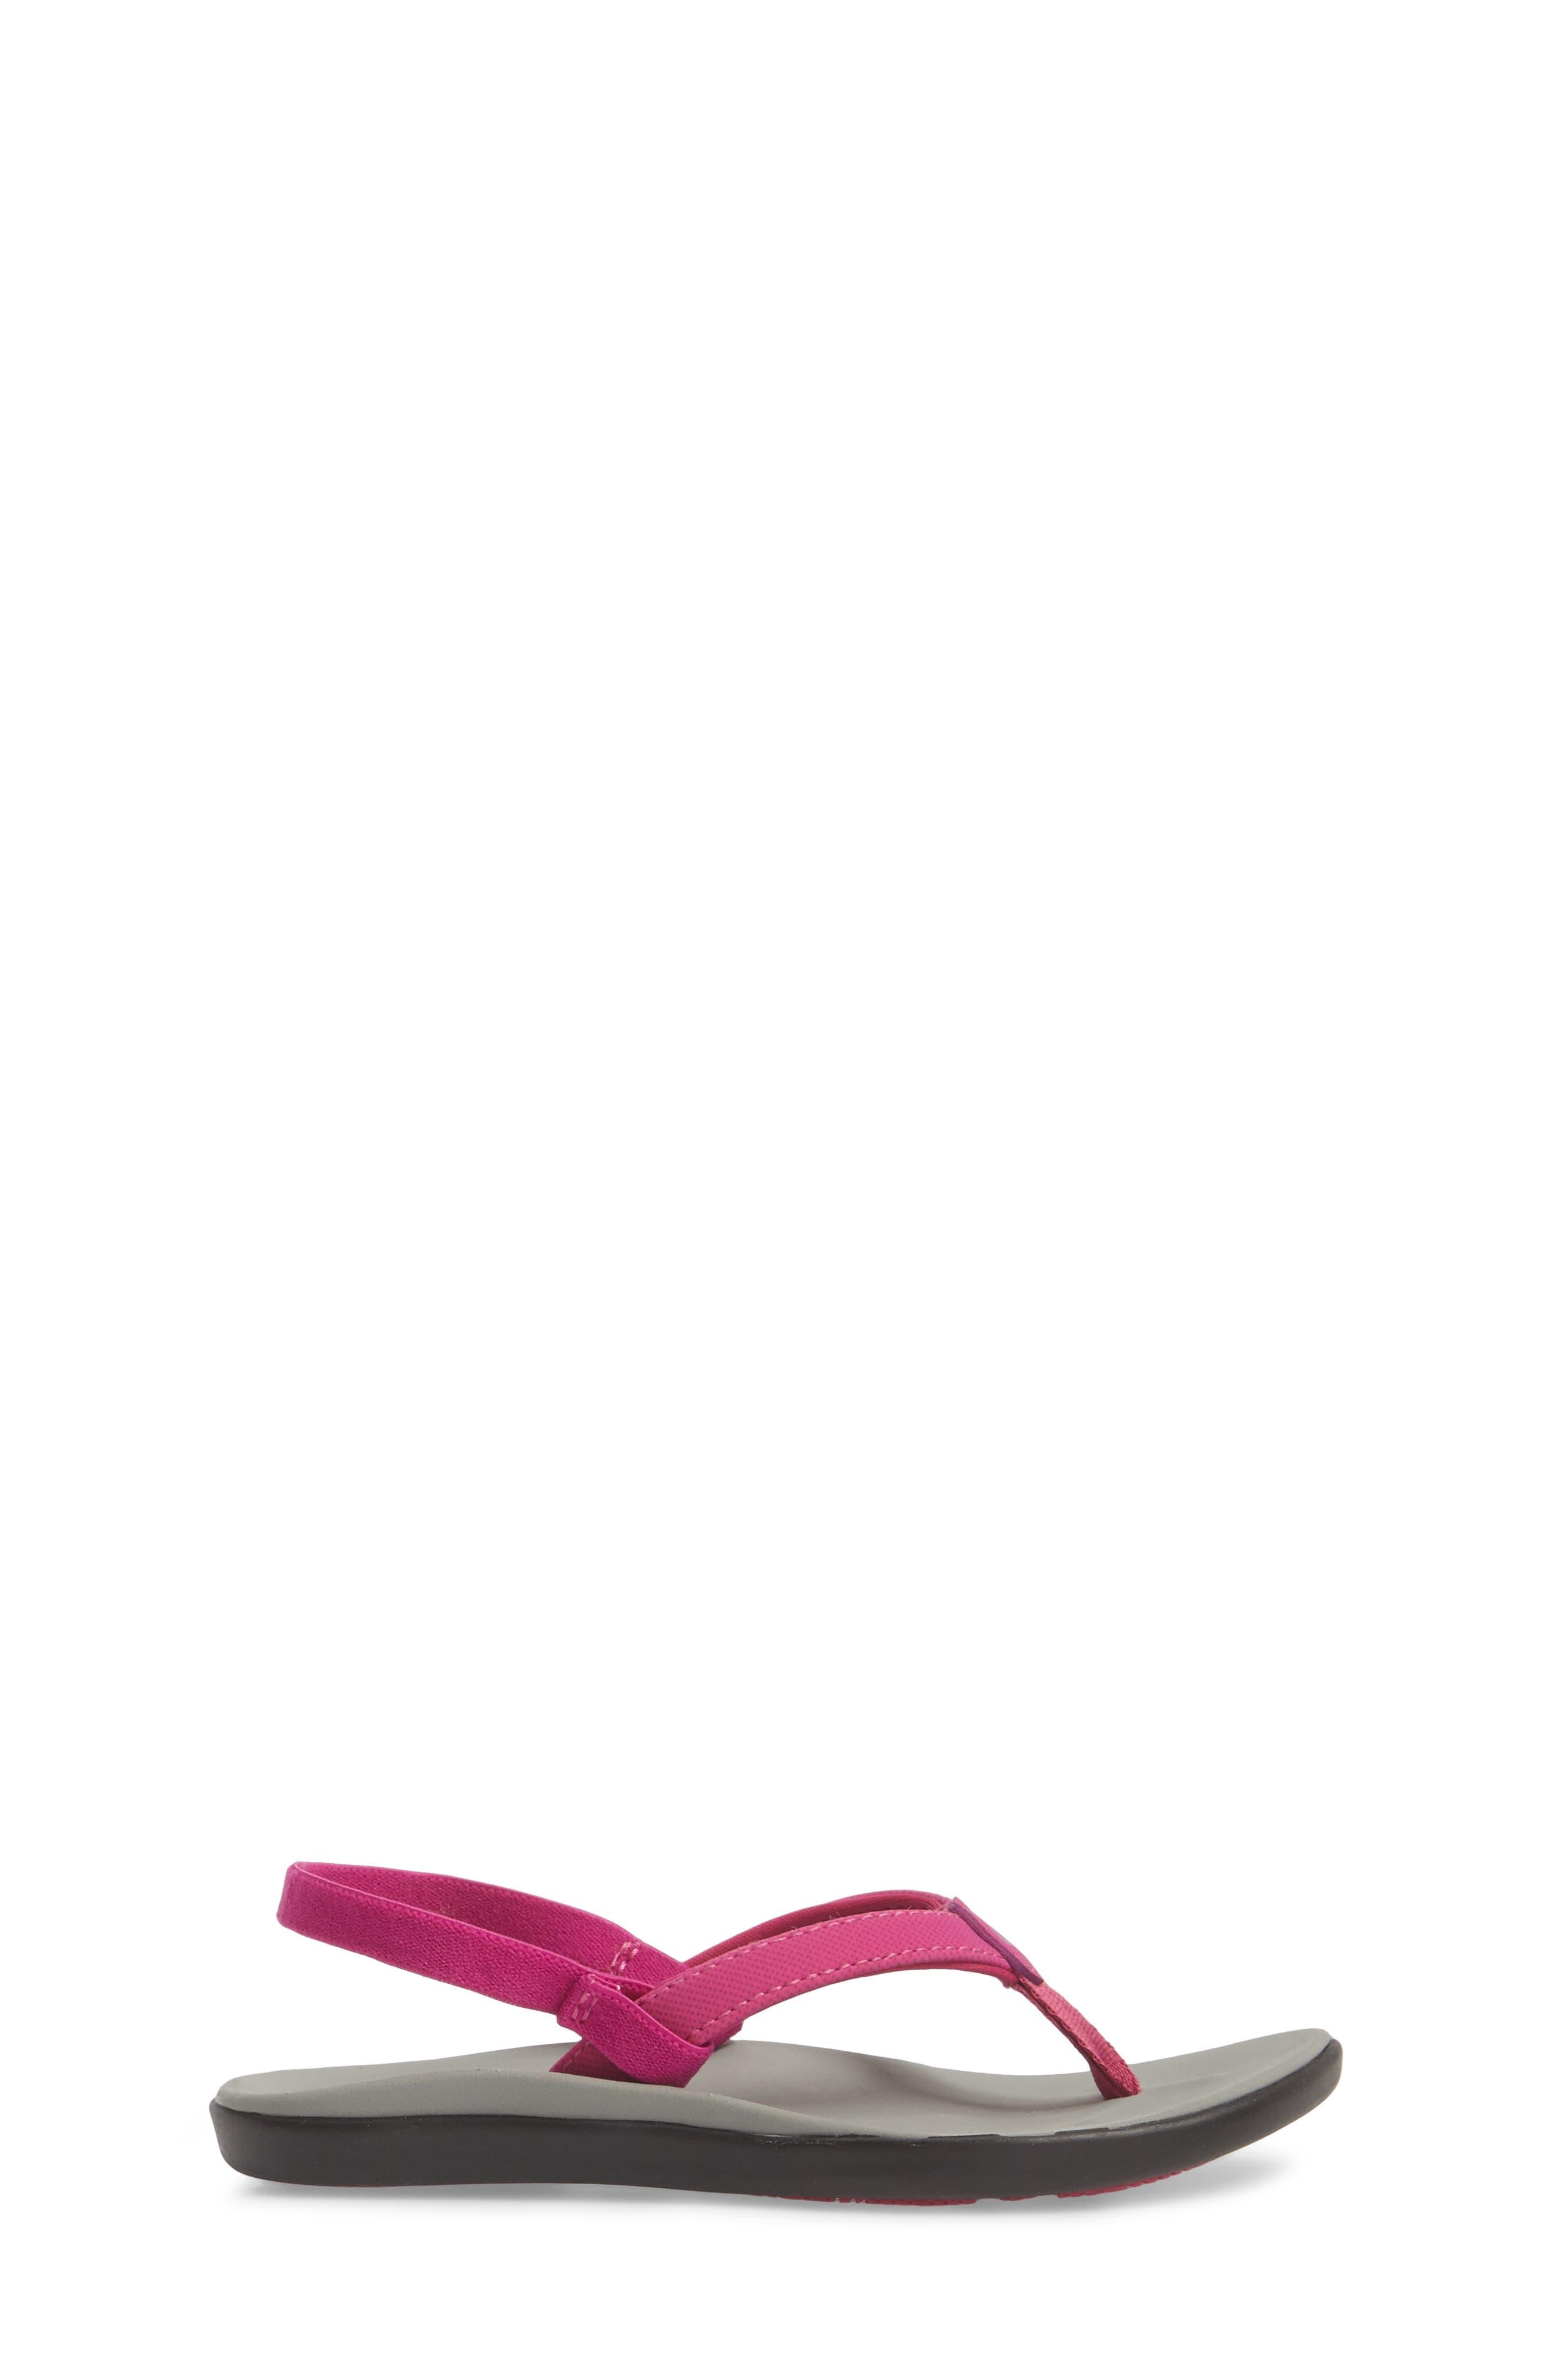 Ho'opio Sandal,                             Alternate thumbnail 3, color,                             Grape Juice/ Pale Grey